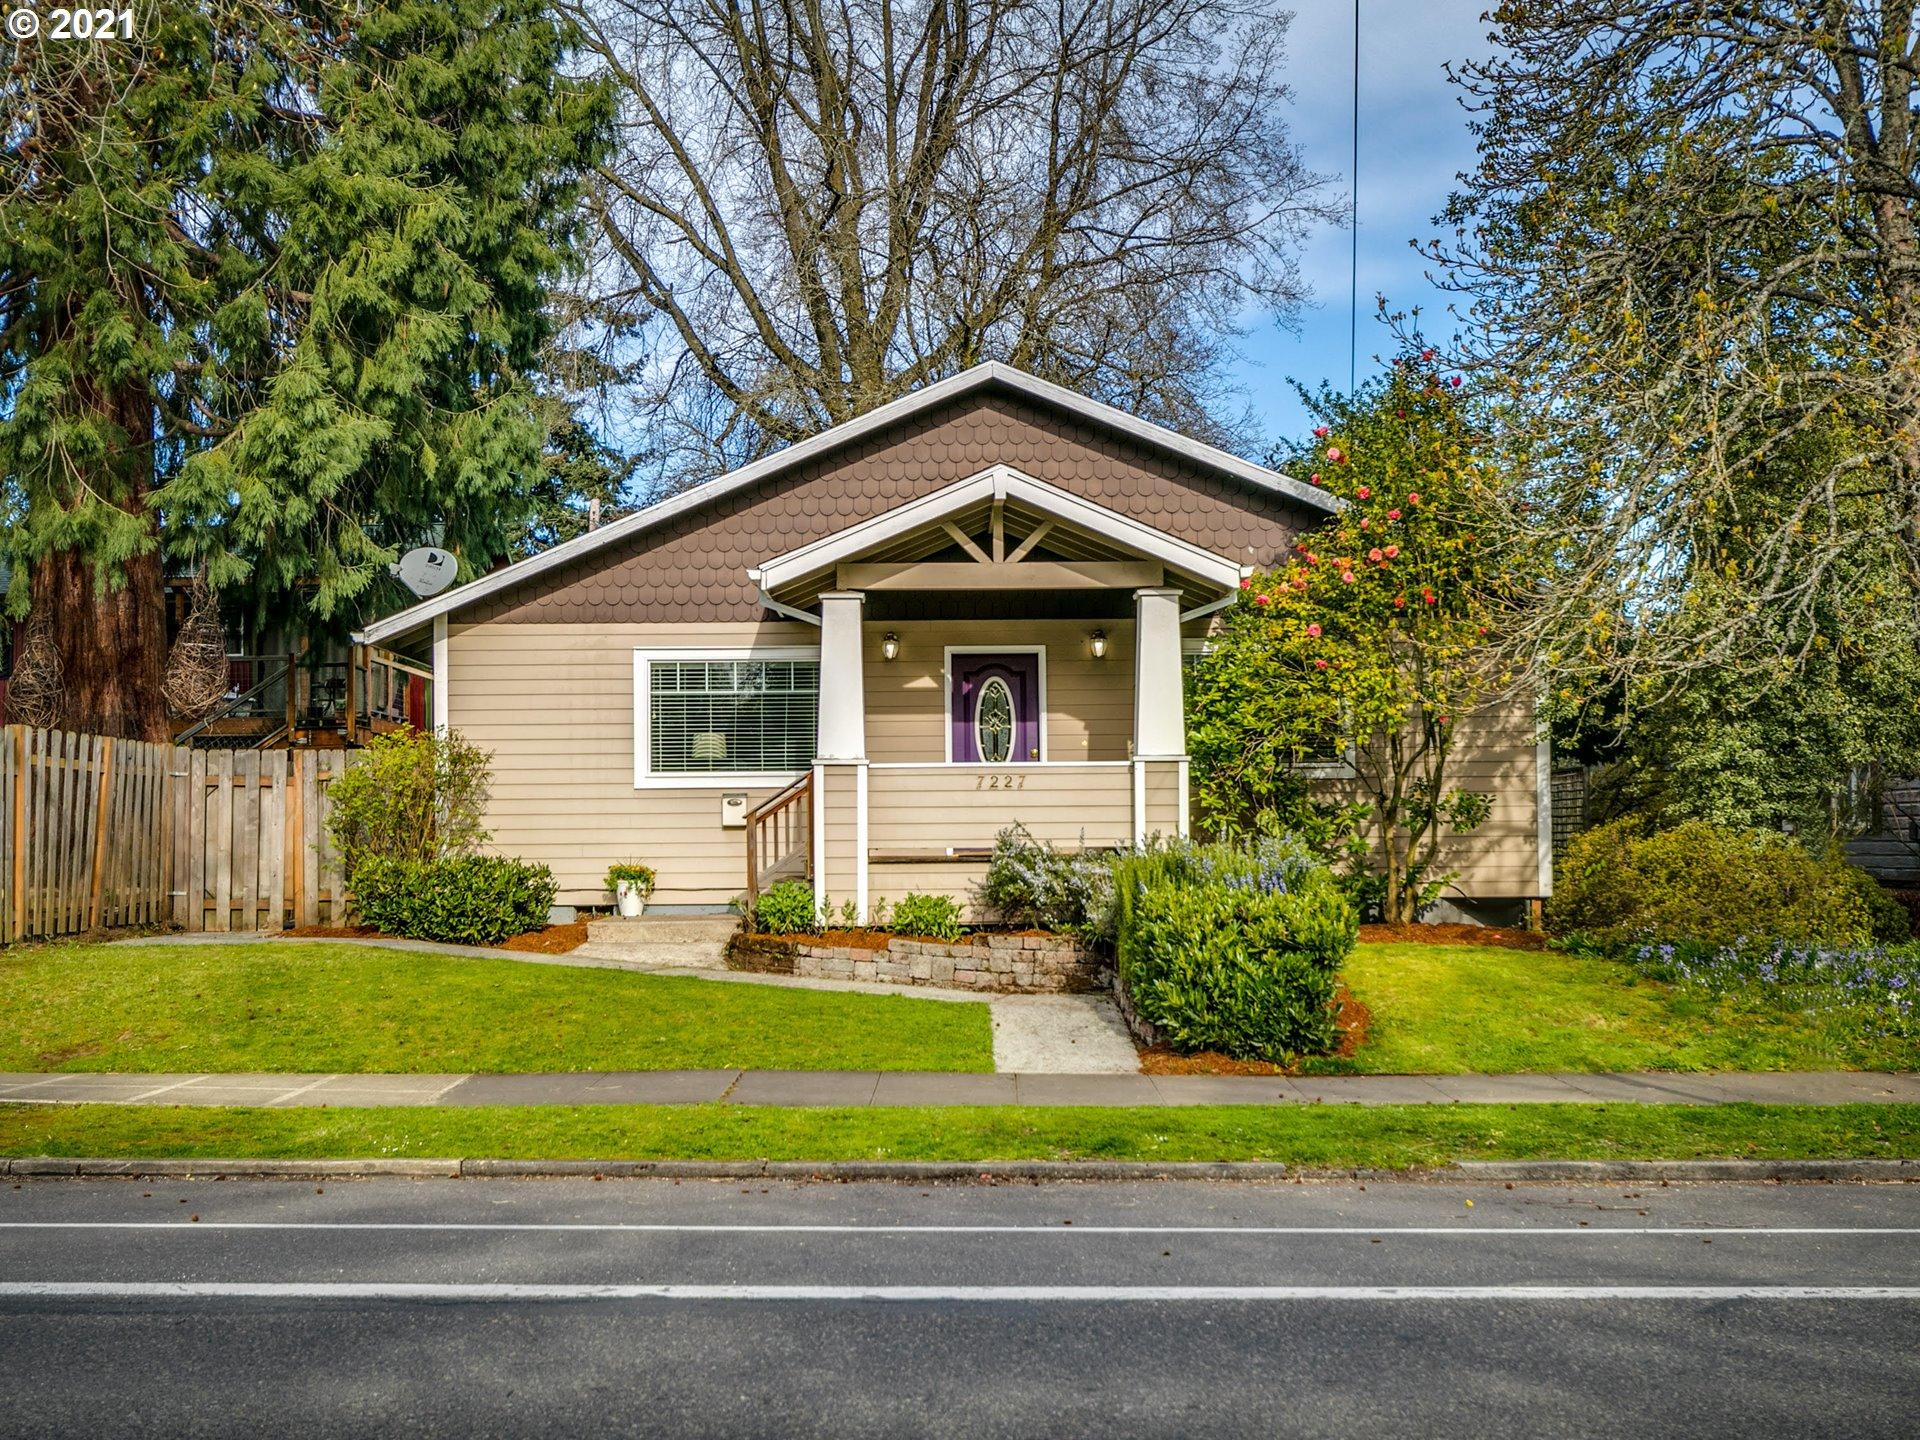 7227 N PORTSMOUTH AVE, Portland OR 97203